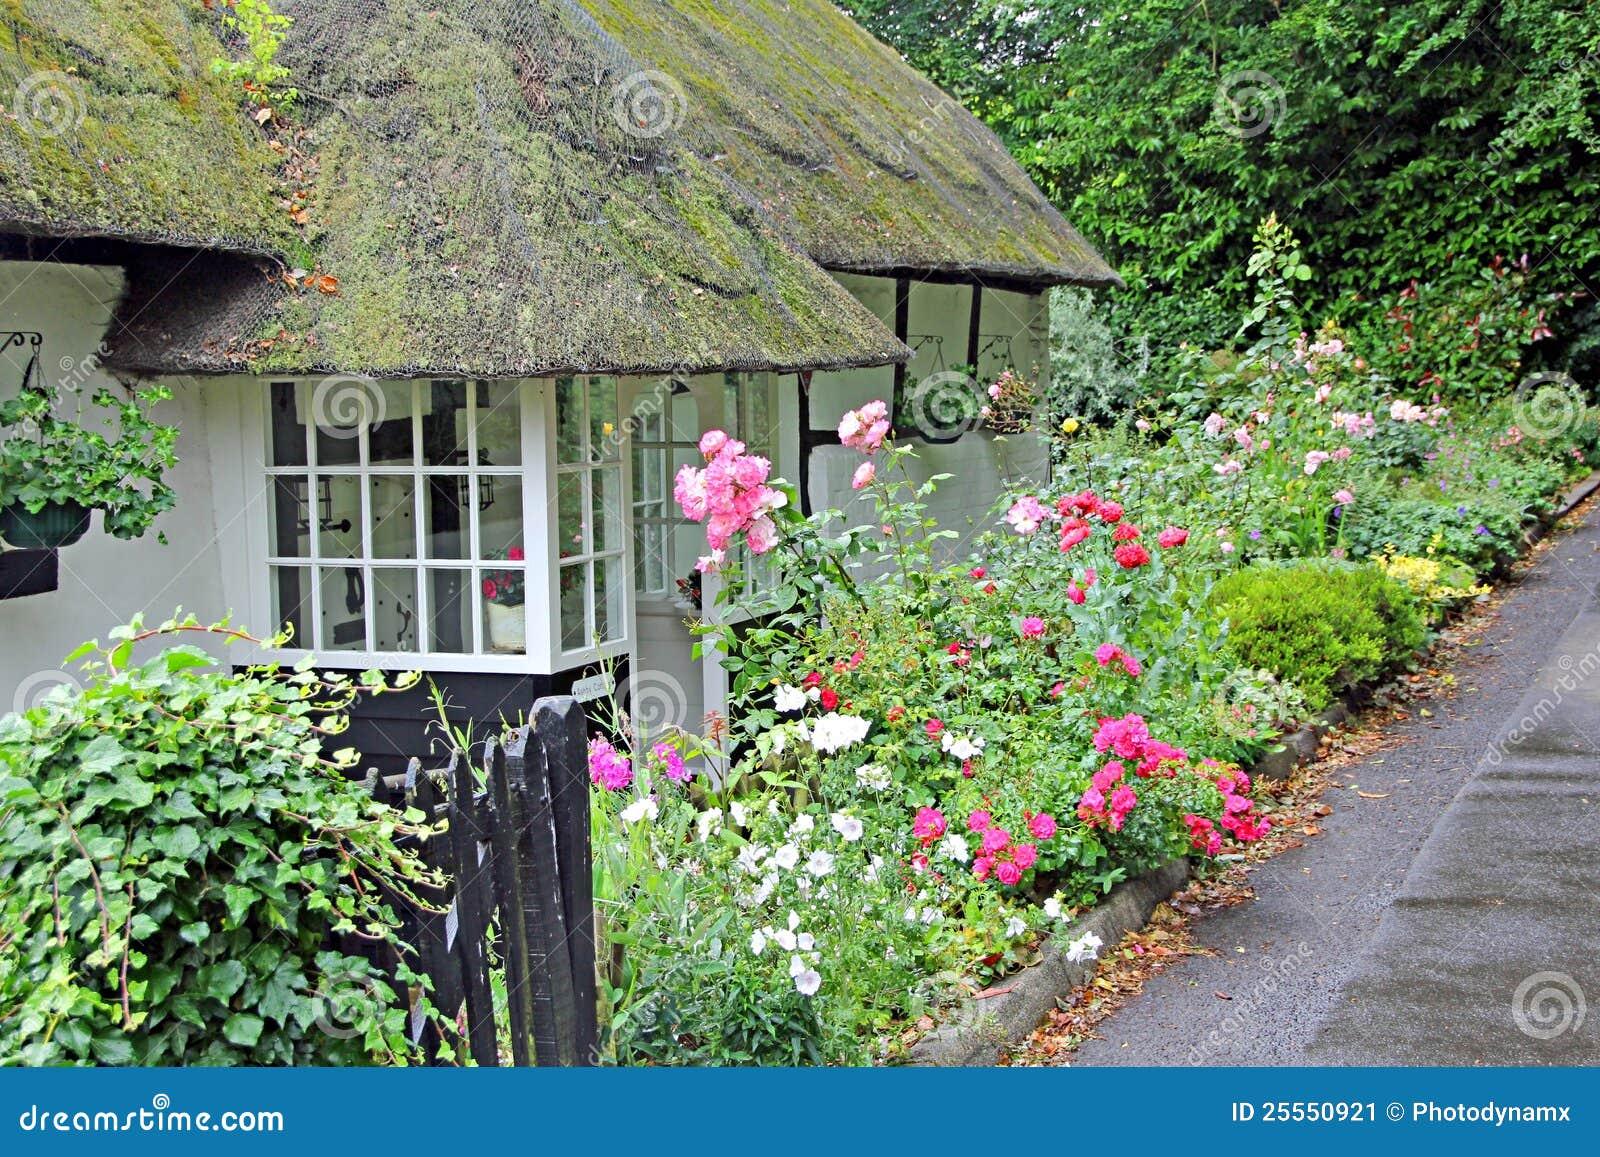 Kent thatched a casa de campo.